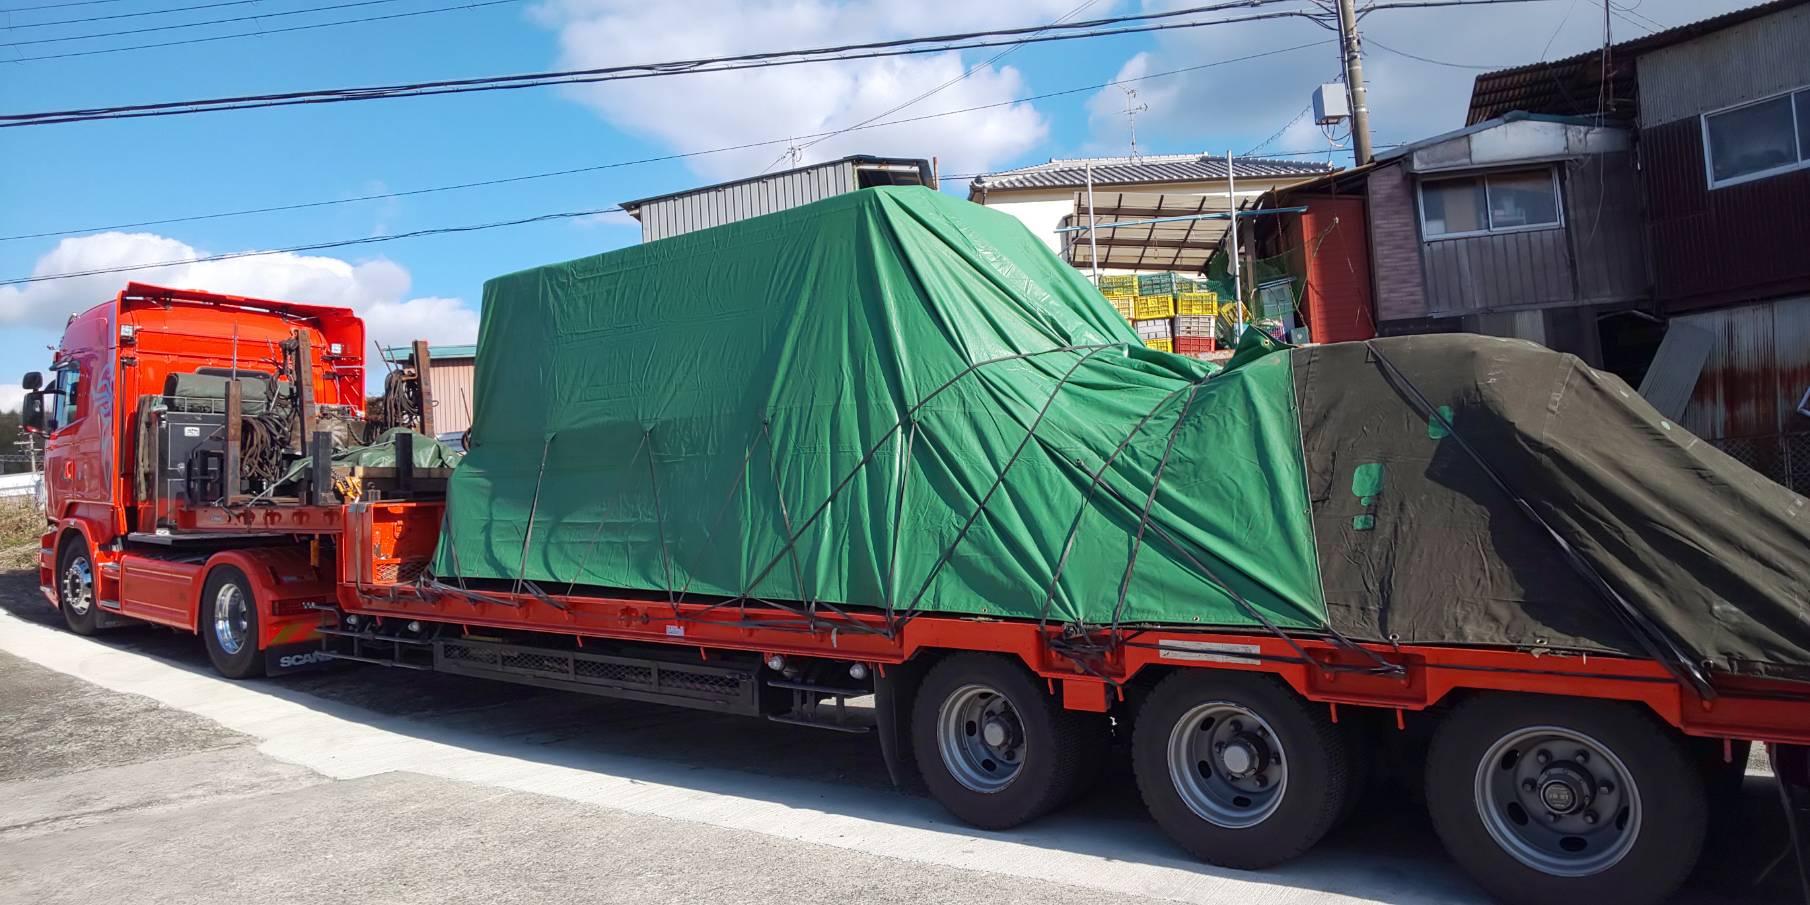 trucklady5_めぐりん (11)